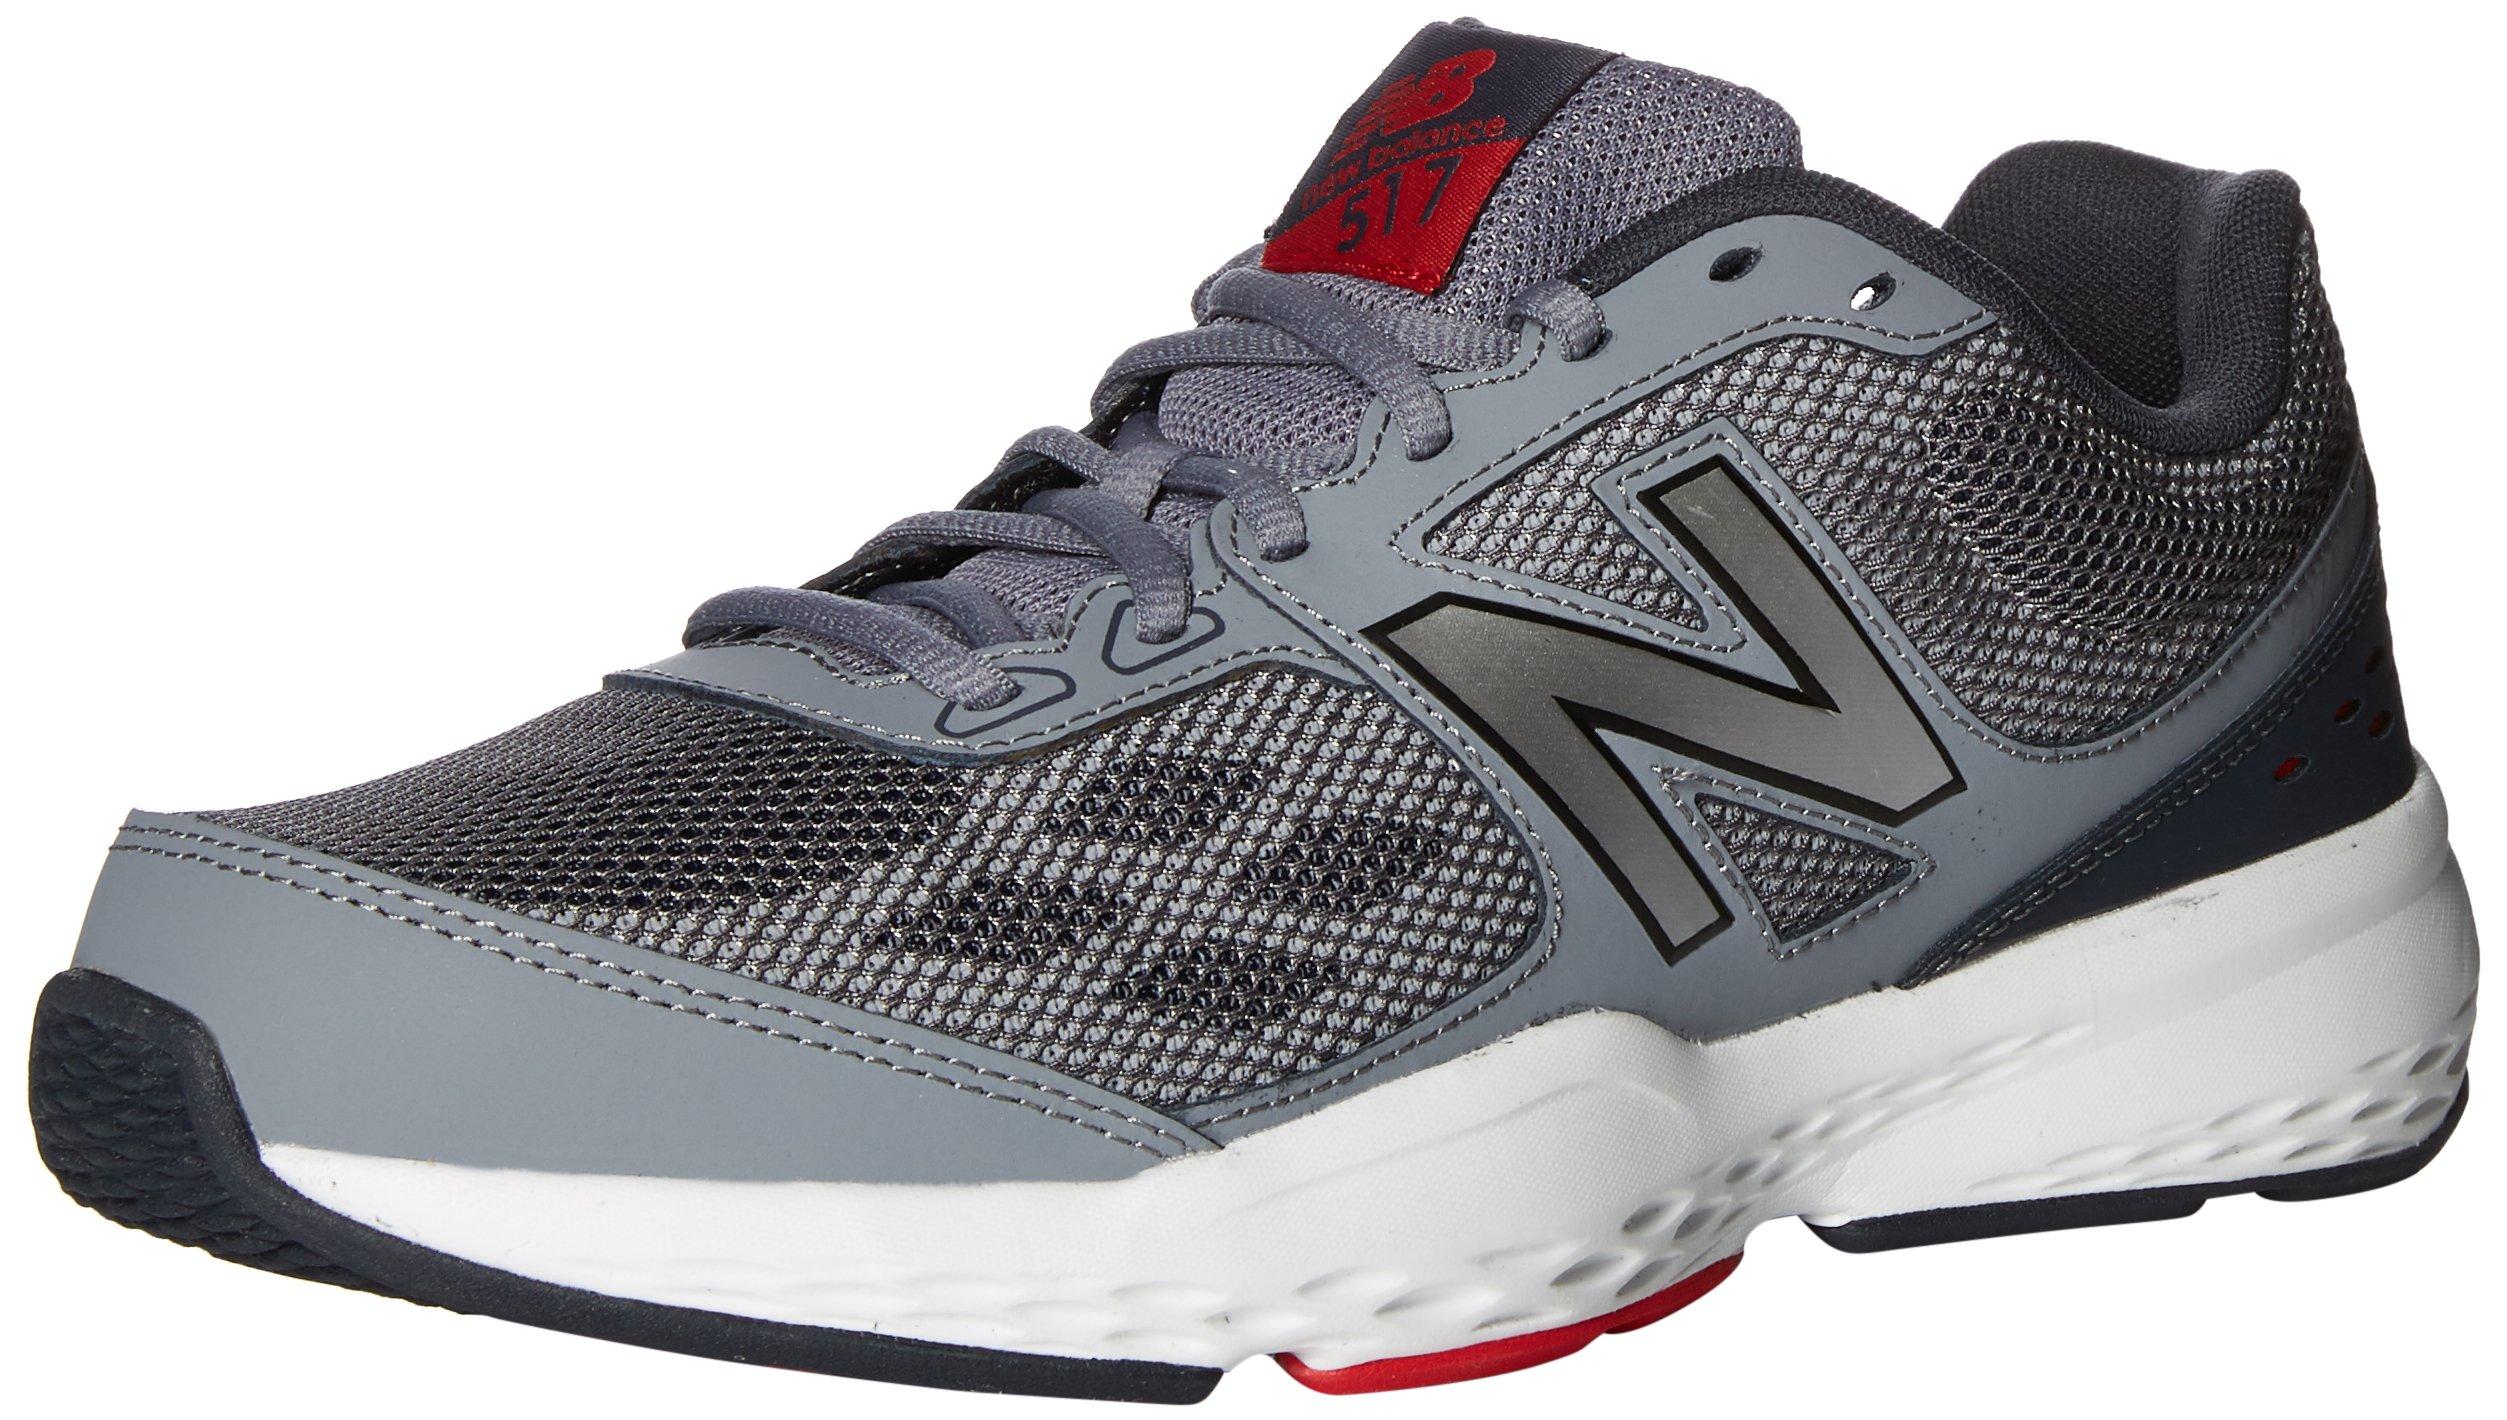 New Balance Men's MX517v1 Training Shoe, Grey/Red, 12 D US by New Balance